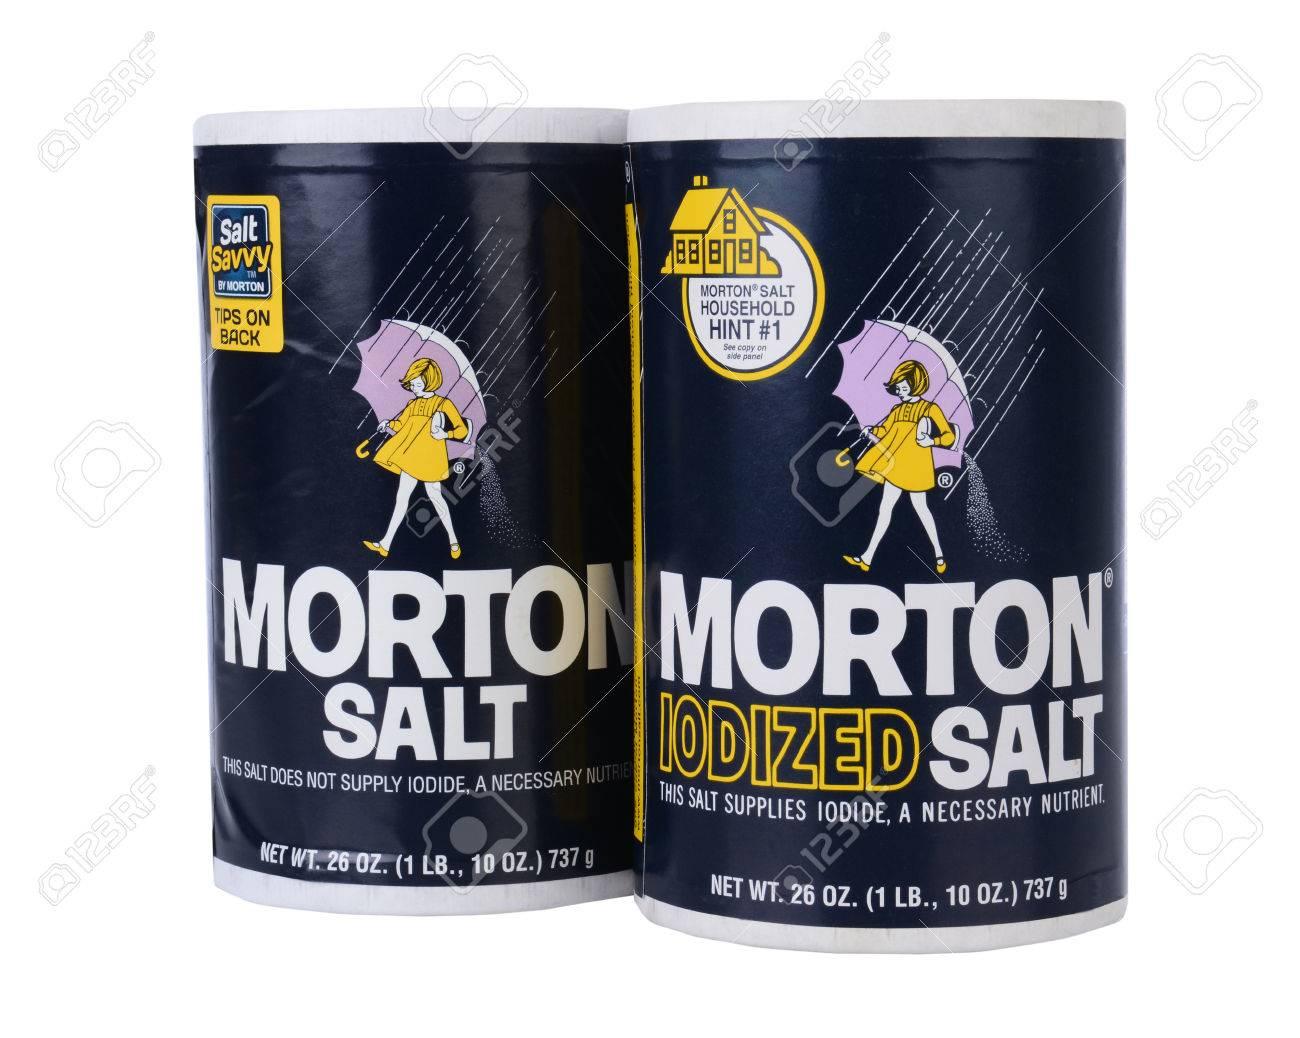 IRVINE, CA - February 06, 2013: Two Boxes of Morton Salt, one